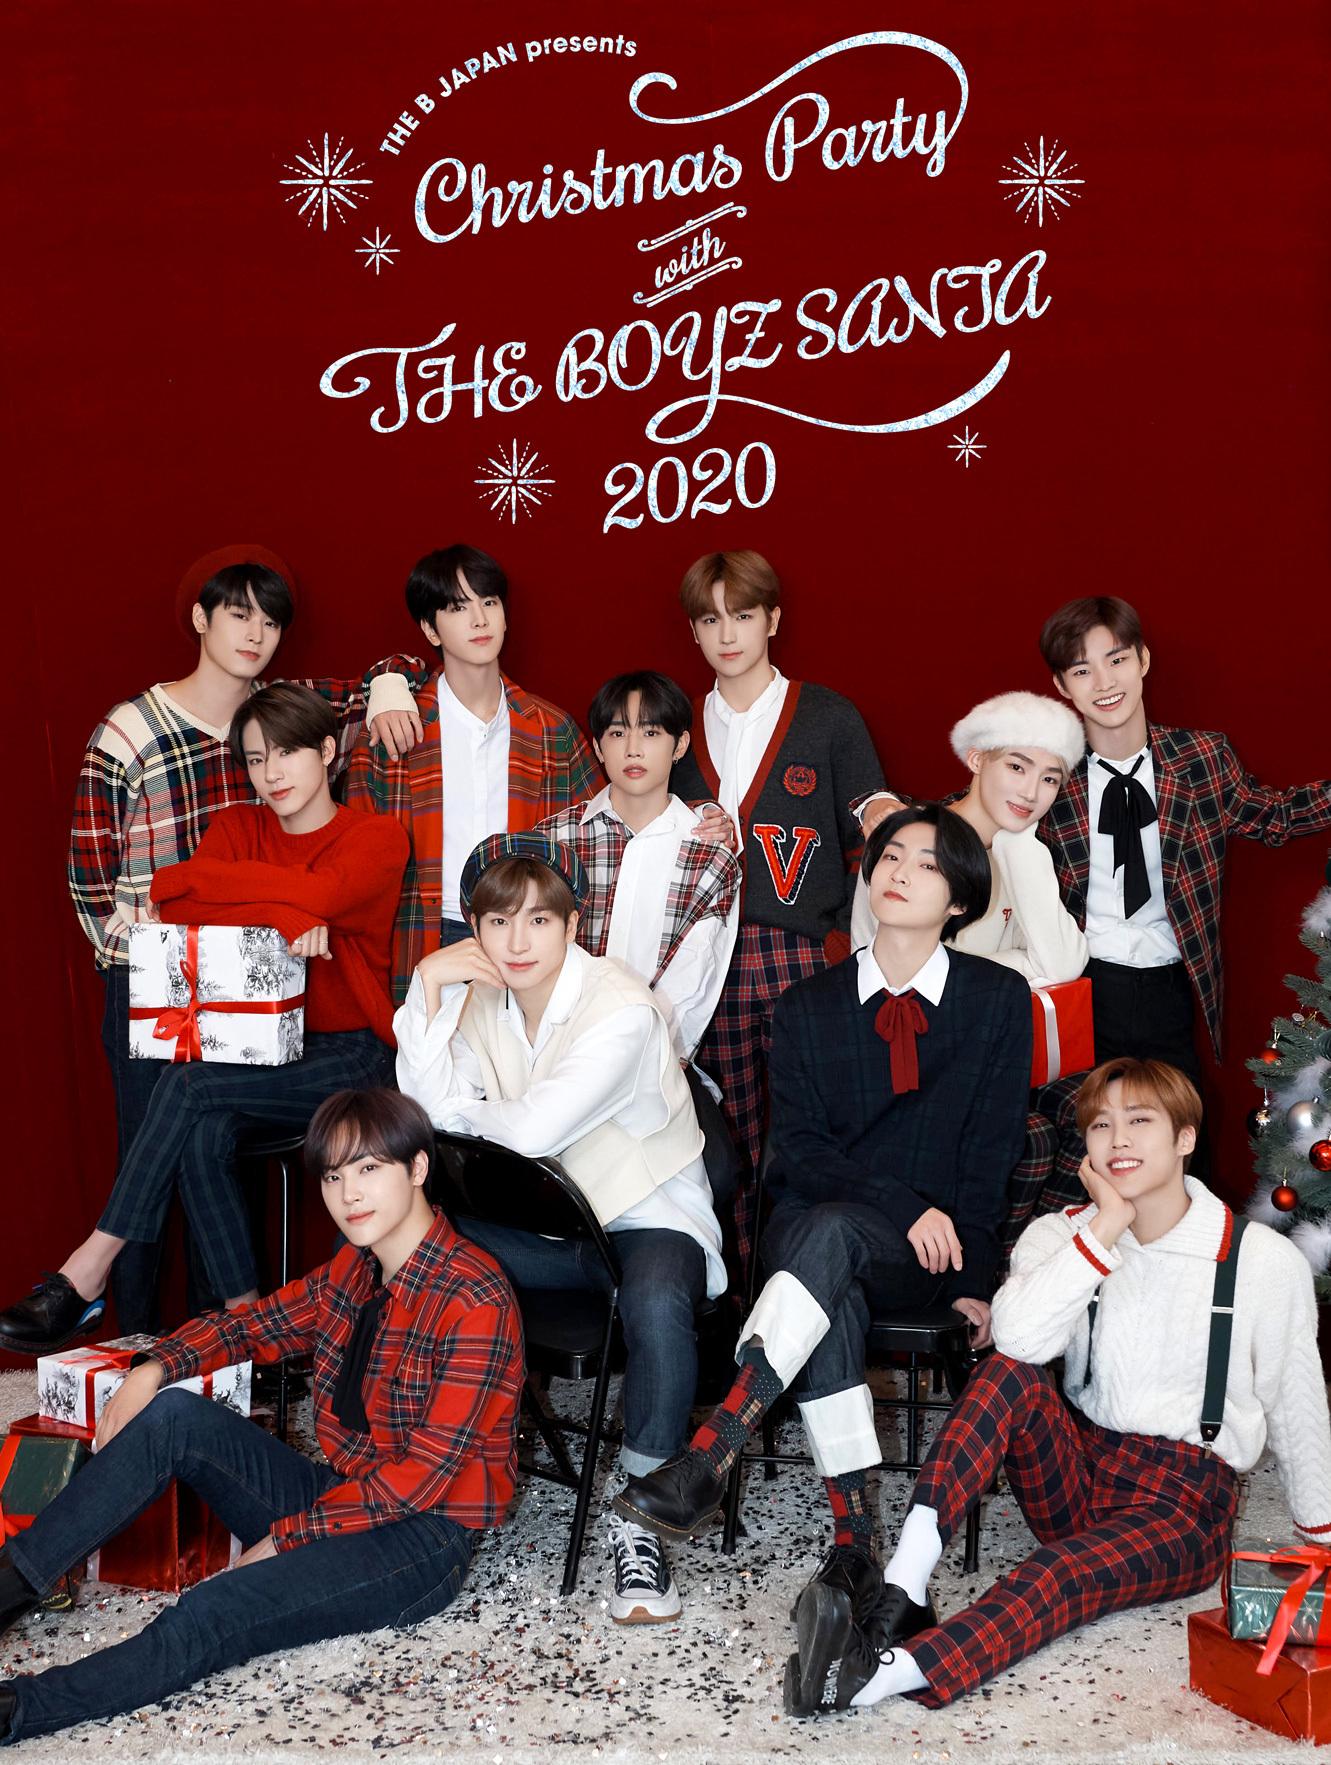 【FC限定】THE B JAPAN presents Christmas Party with THE BOYZ SANTA 2020